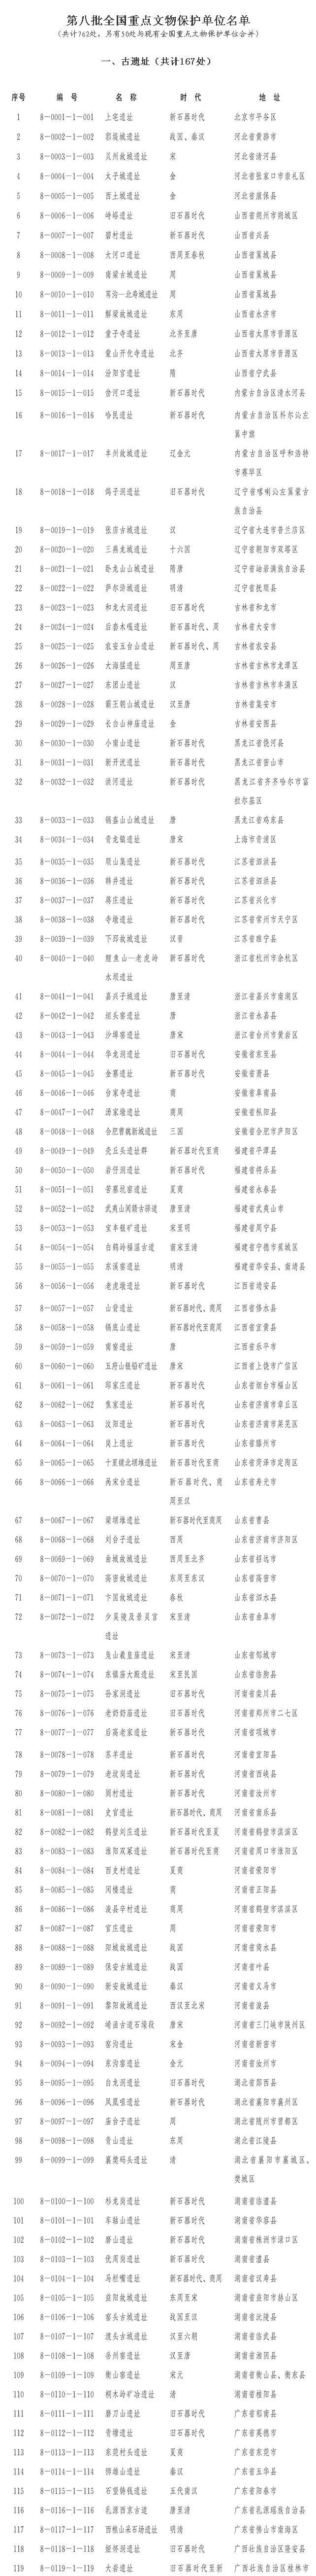 <b>国务院关于核定并公布第八批全国重点文物保护单位的通知</b>